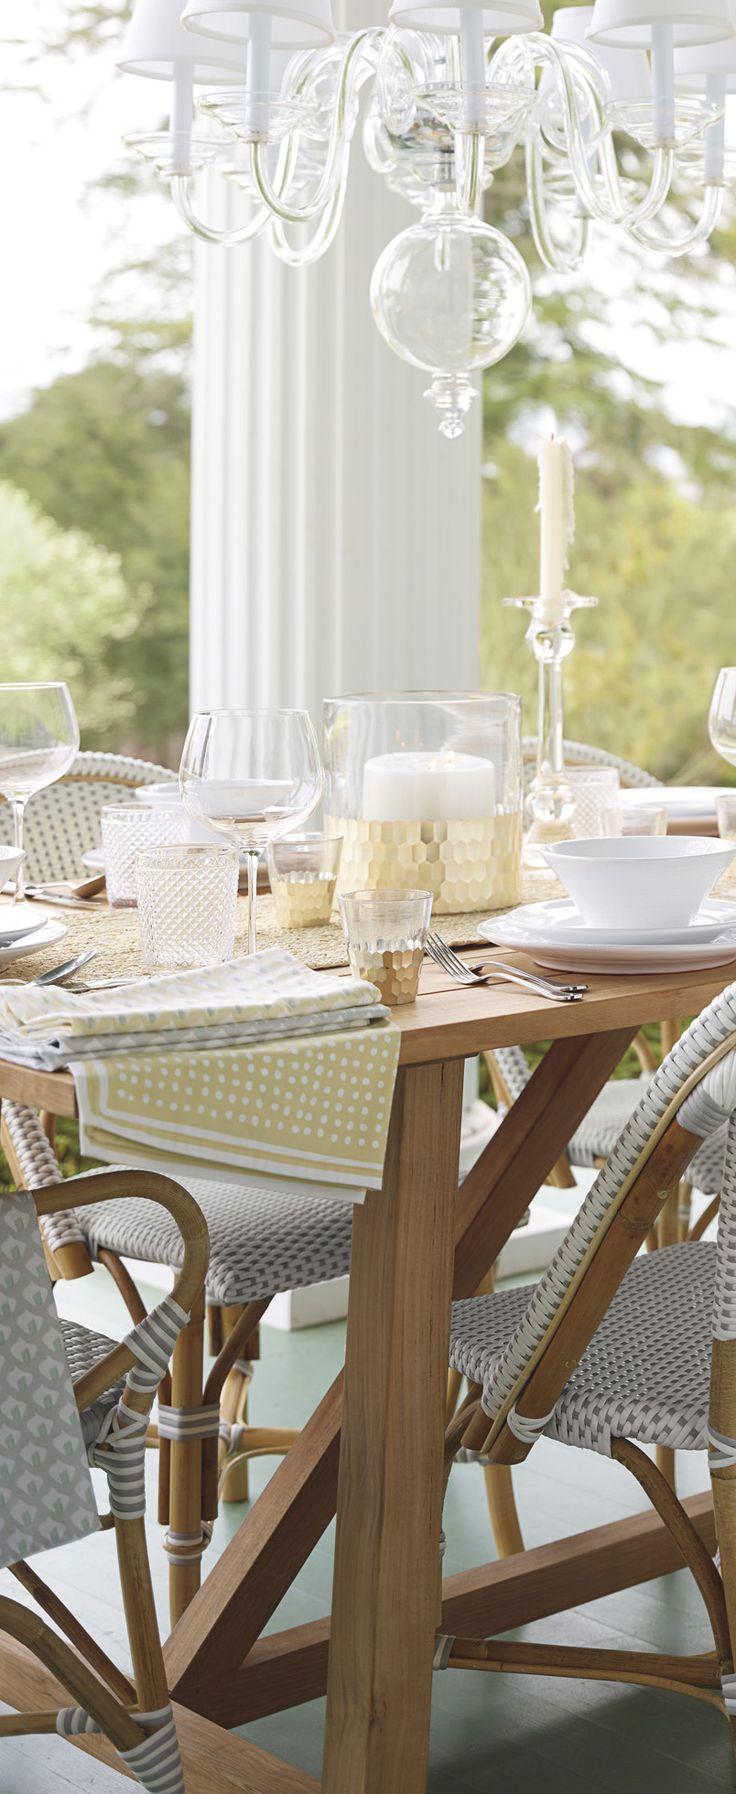 195 Best DINING ROOM Images On Pinterest